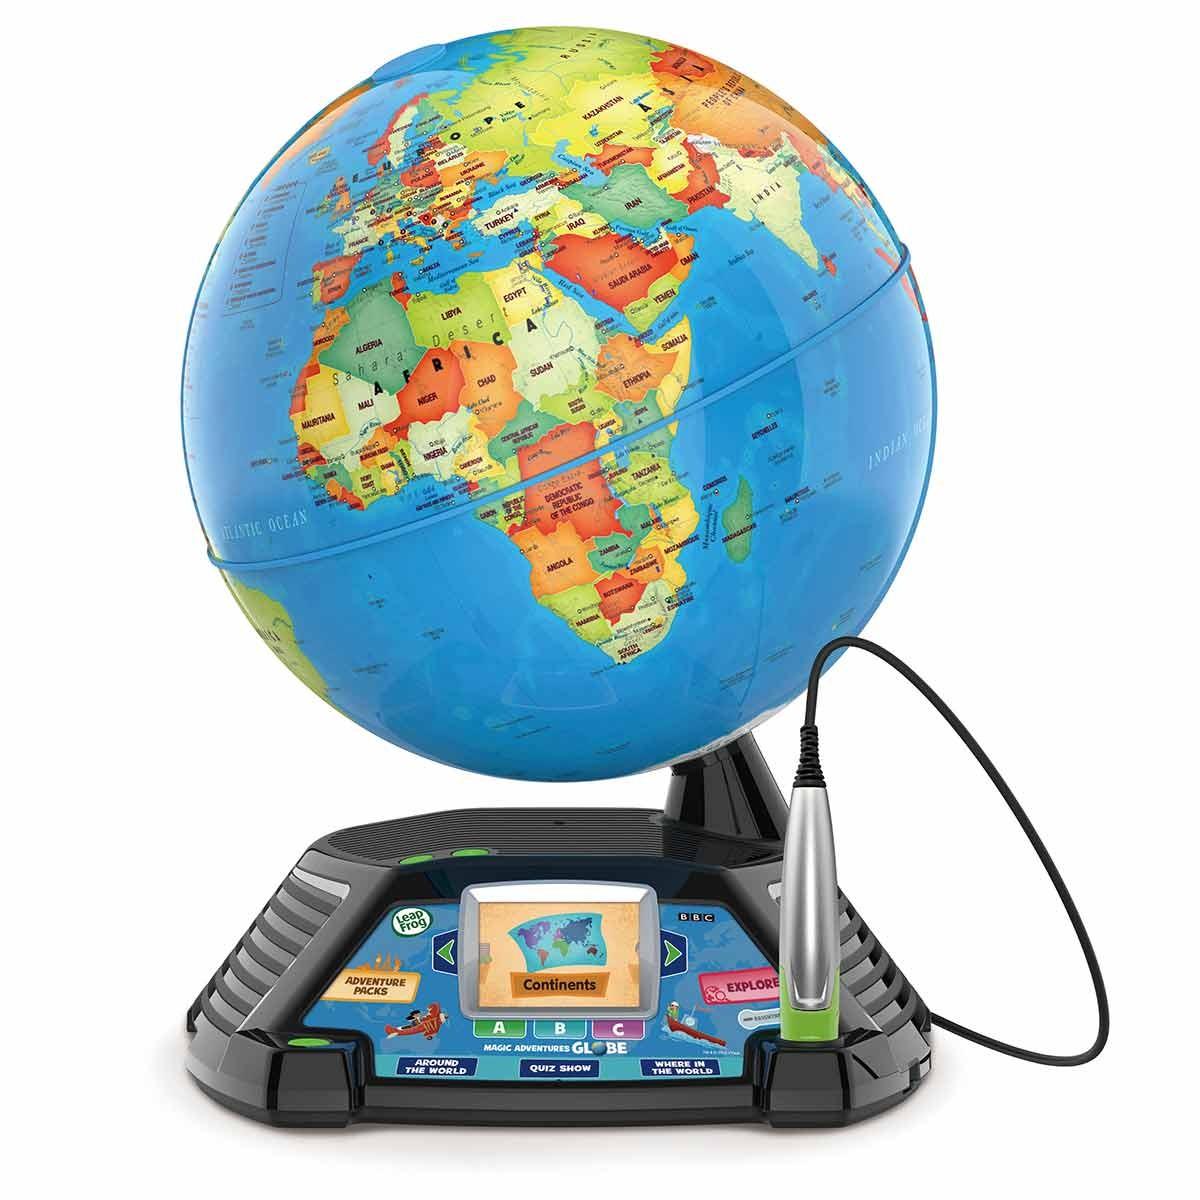 Leapfrog Magic Adventures Globe - £69.99 @ Ryman